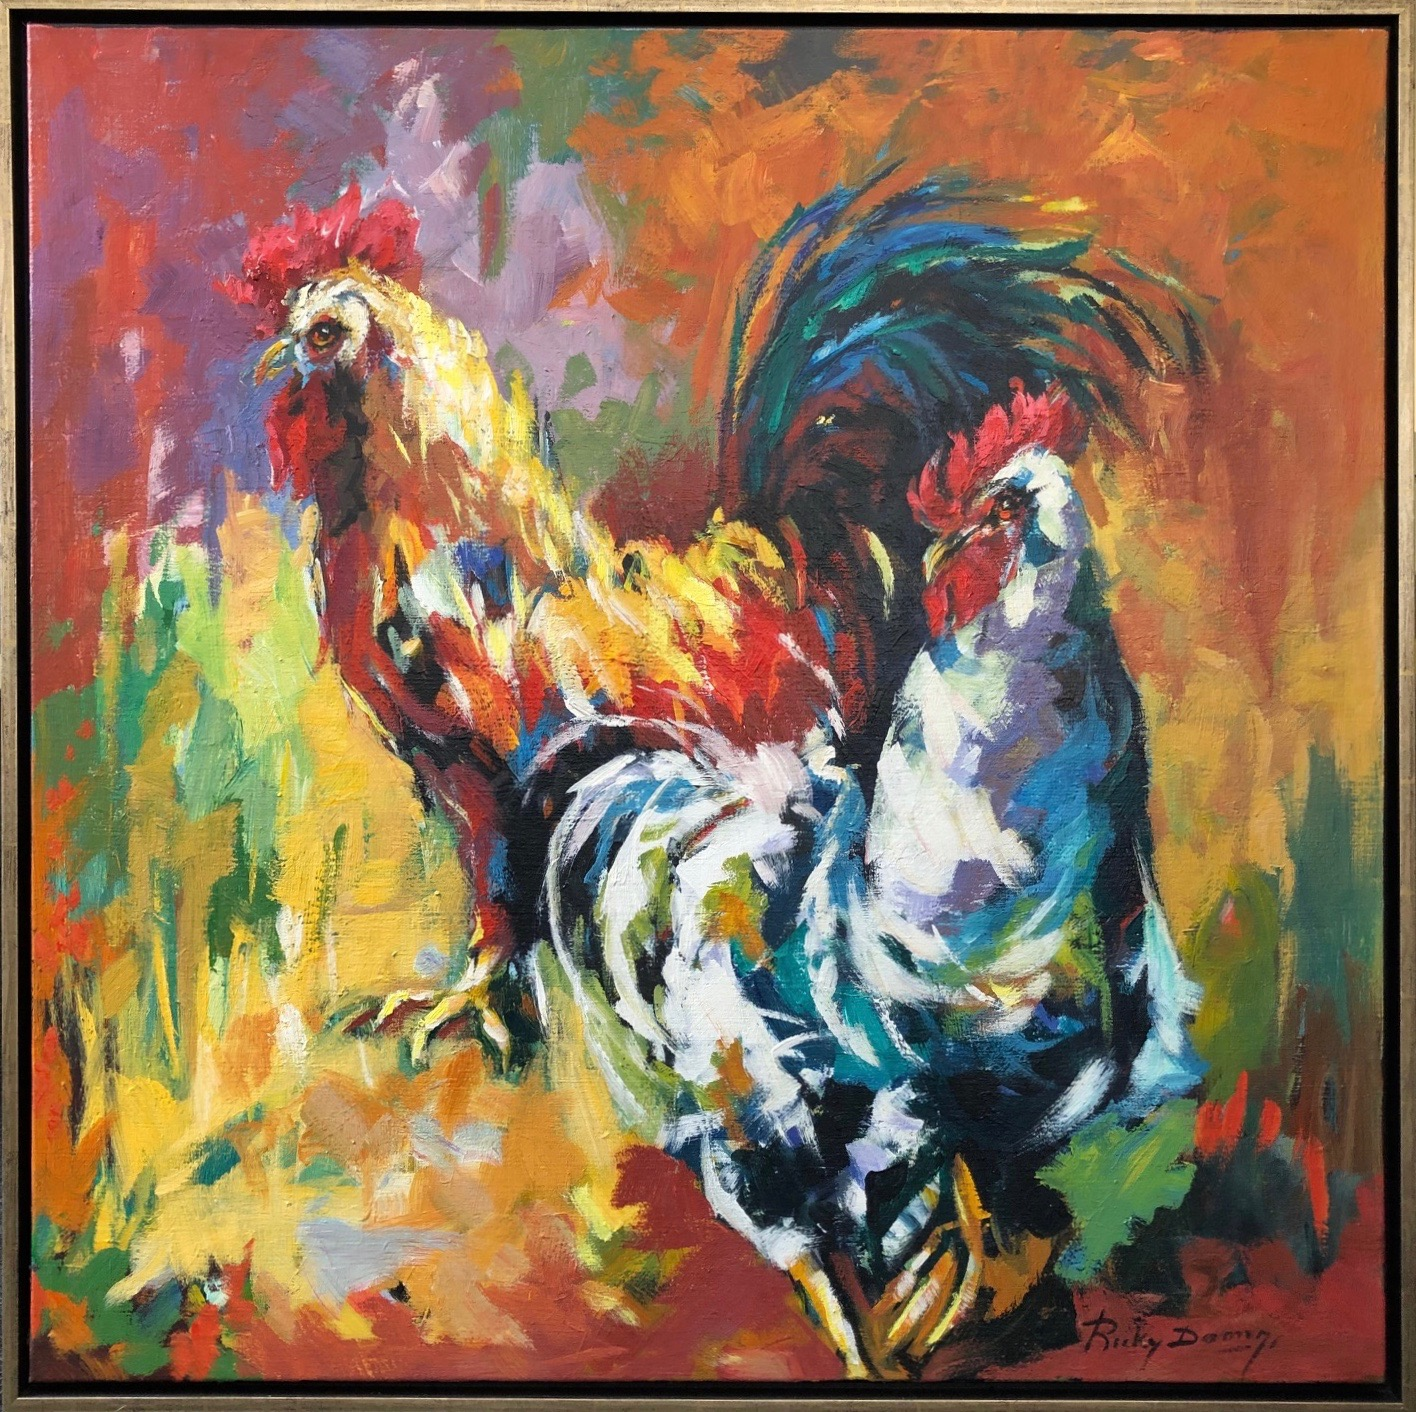 Ricky Damen schilderij 'Chicken and Rooster'